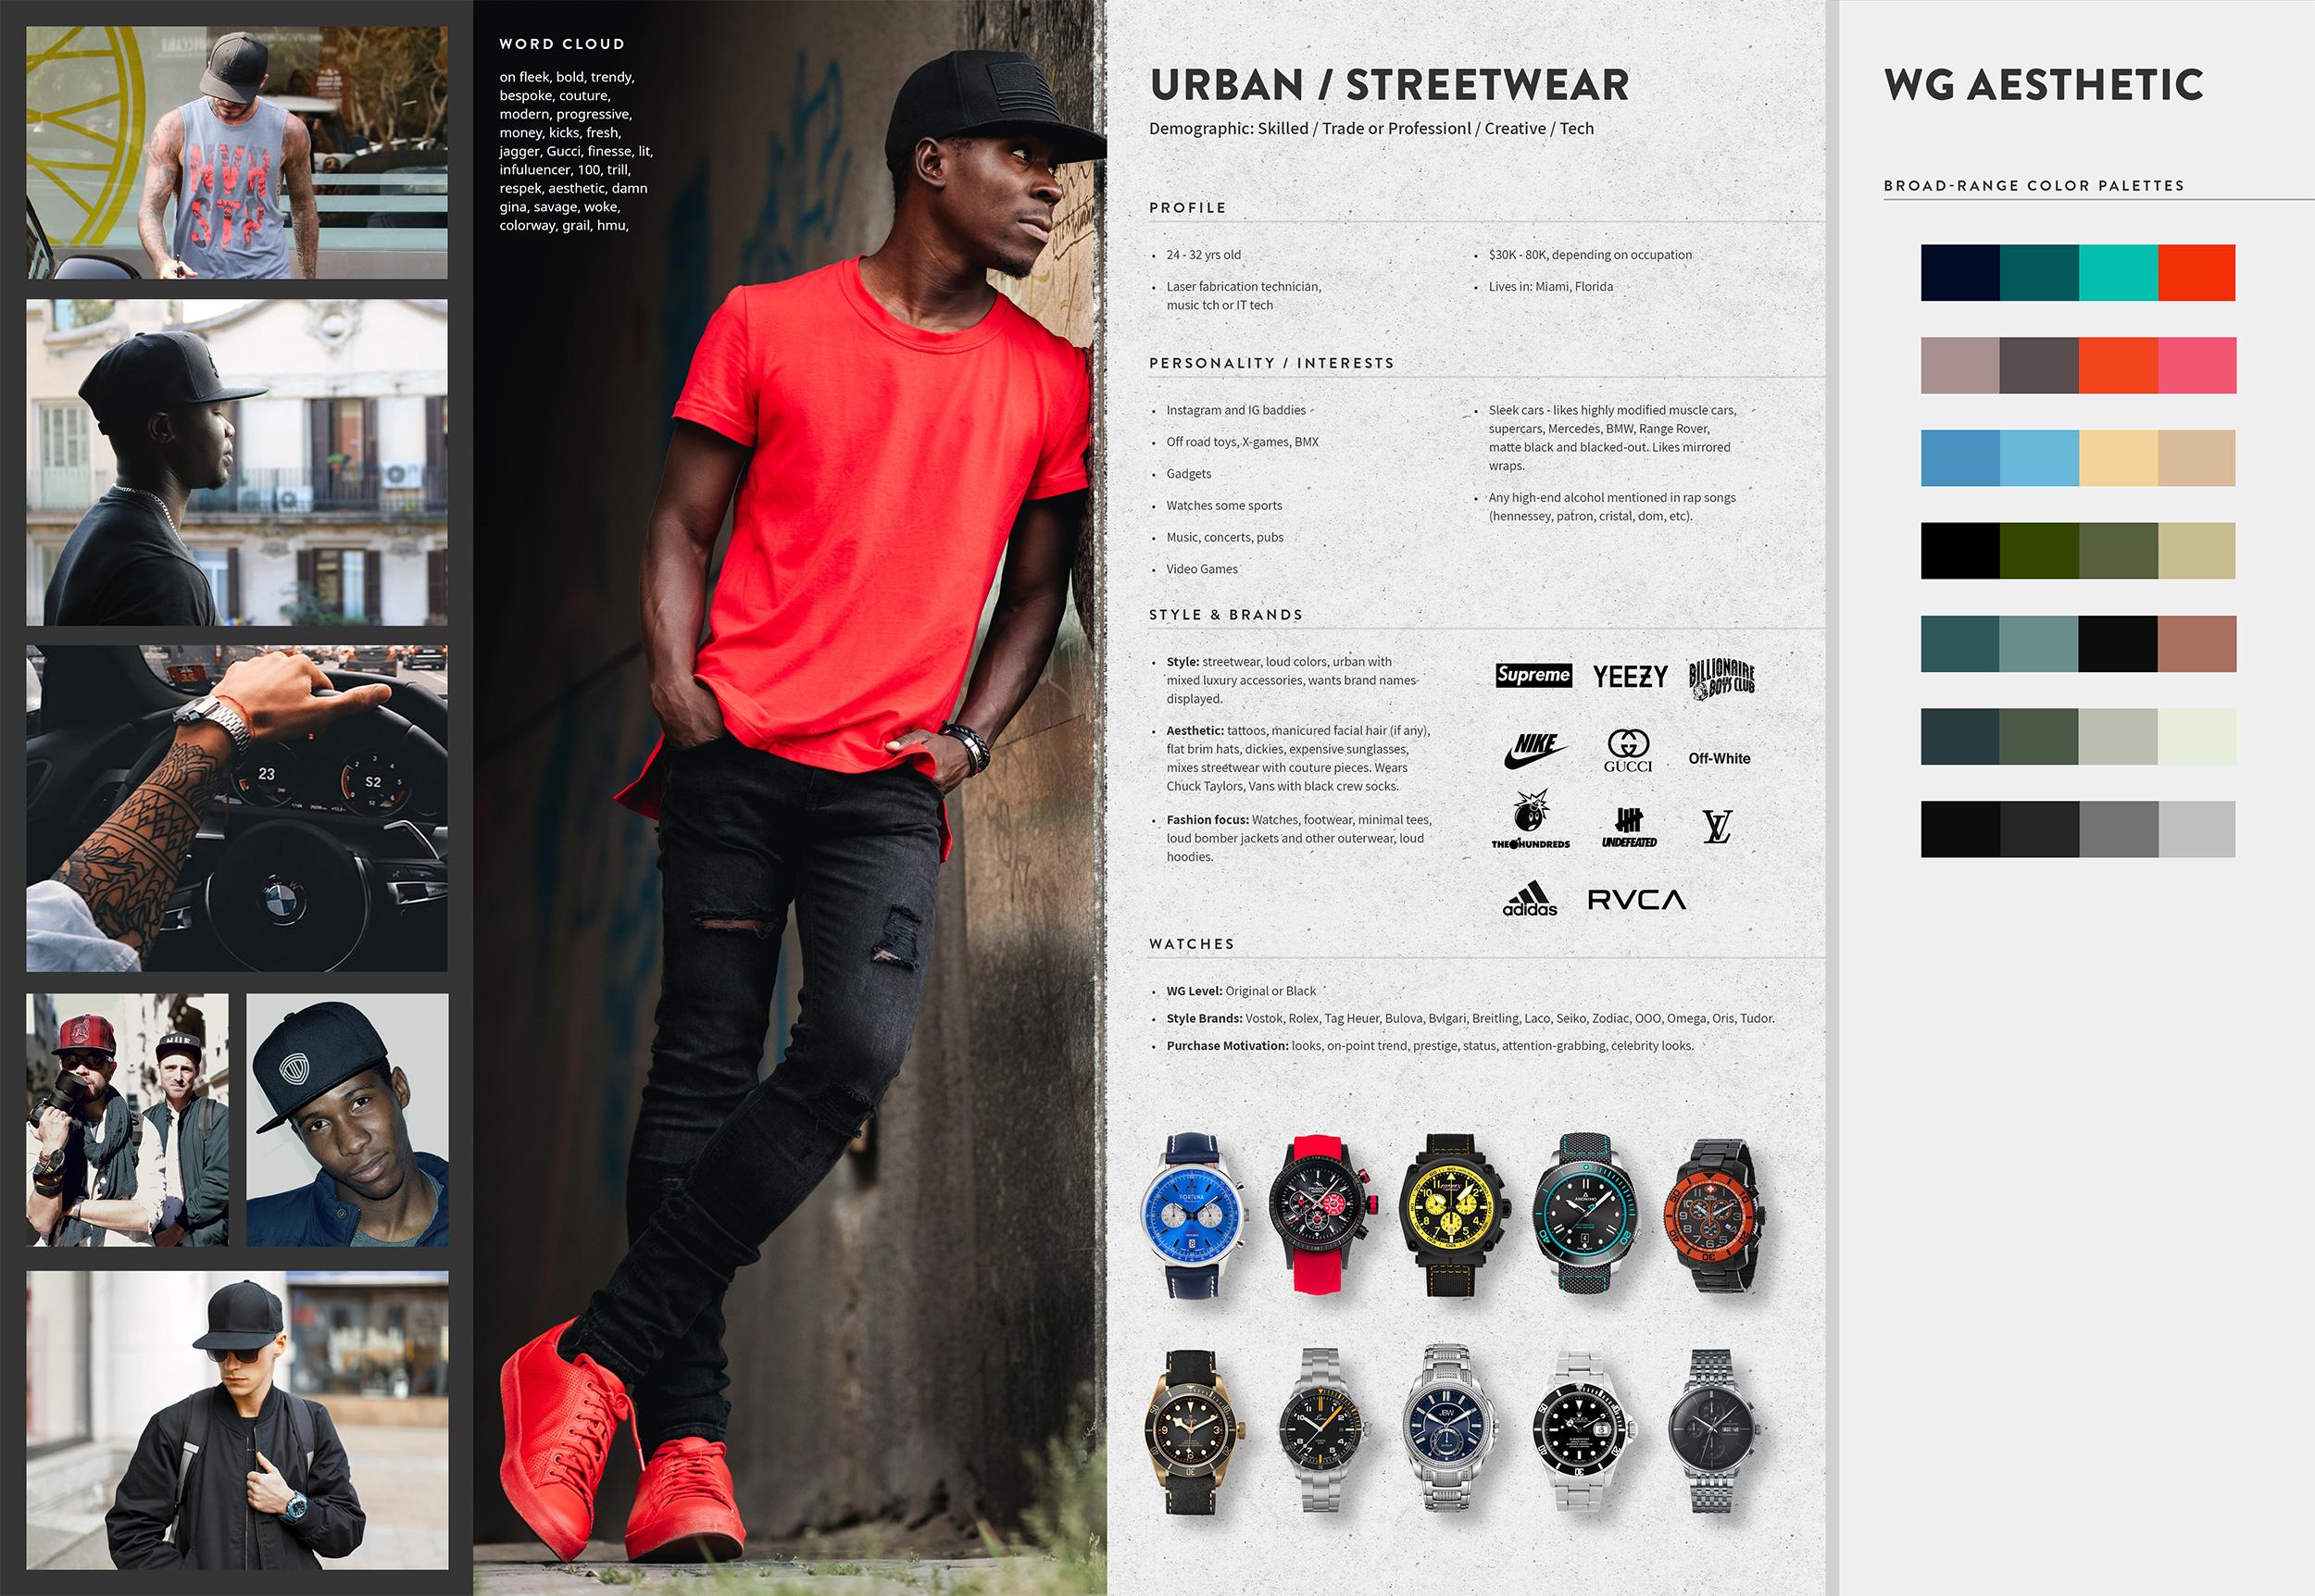 persona-03-urban-streetwear